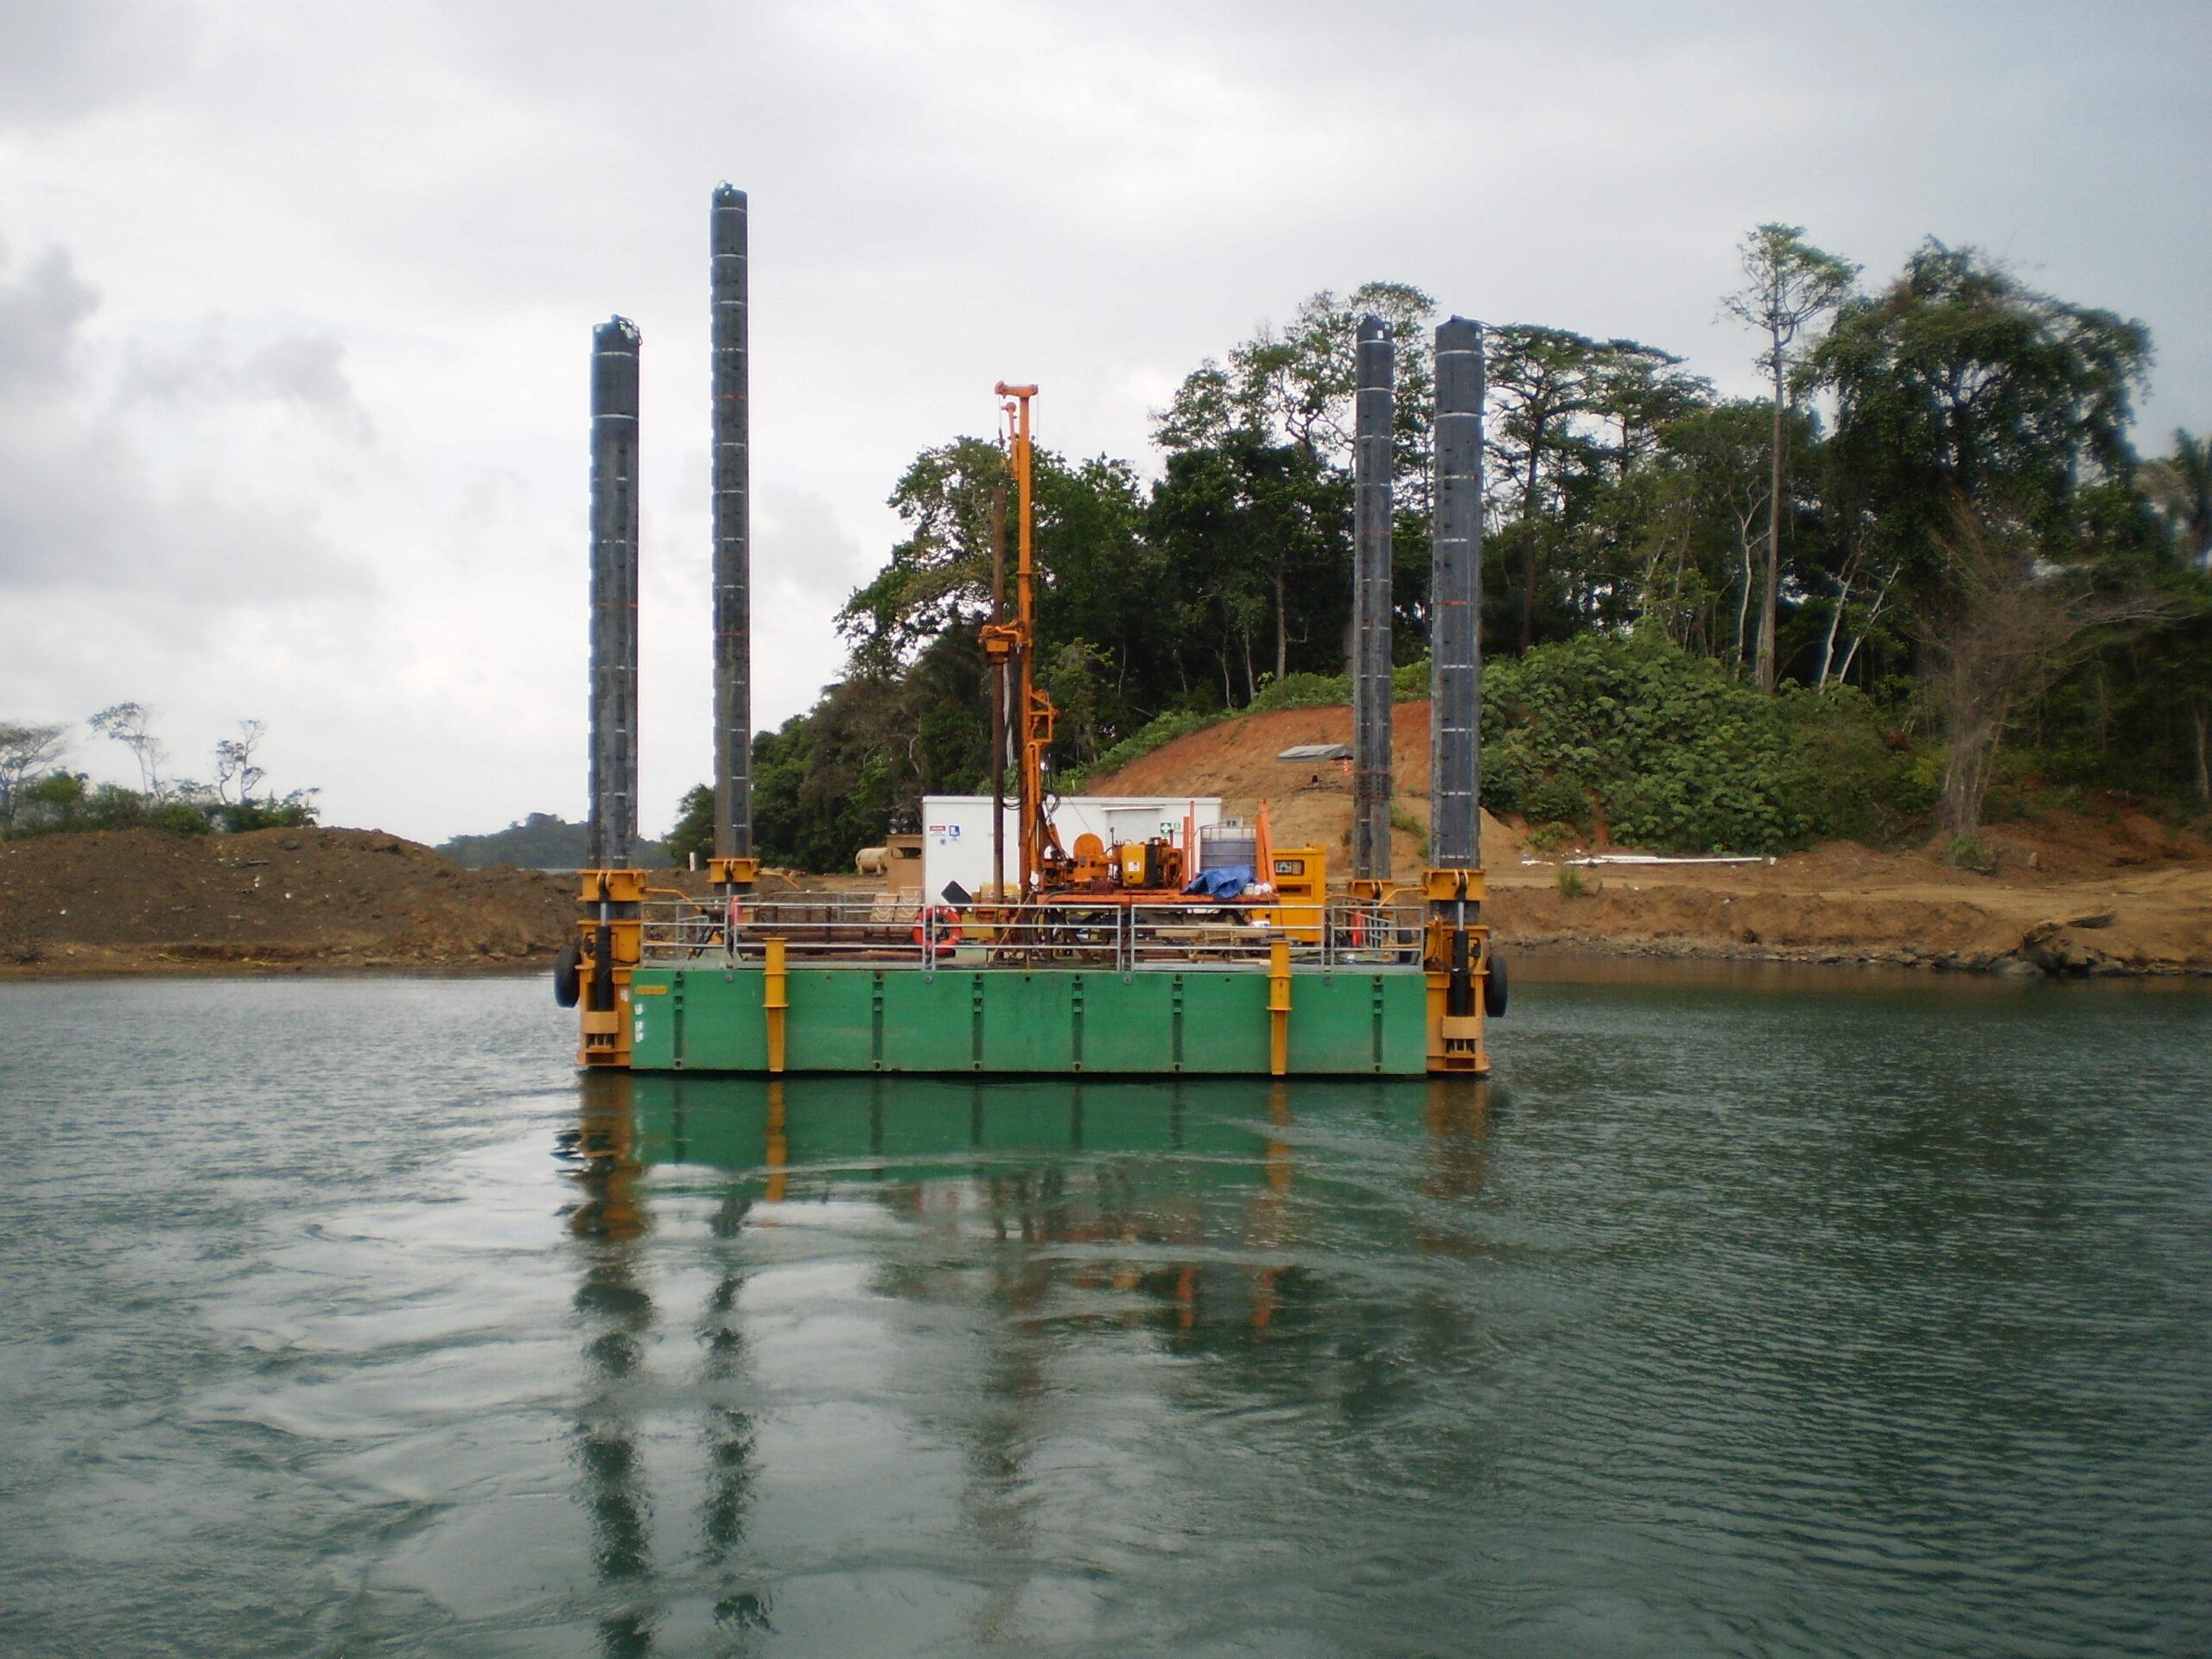 geotechnical modular self elevating platform